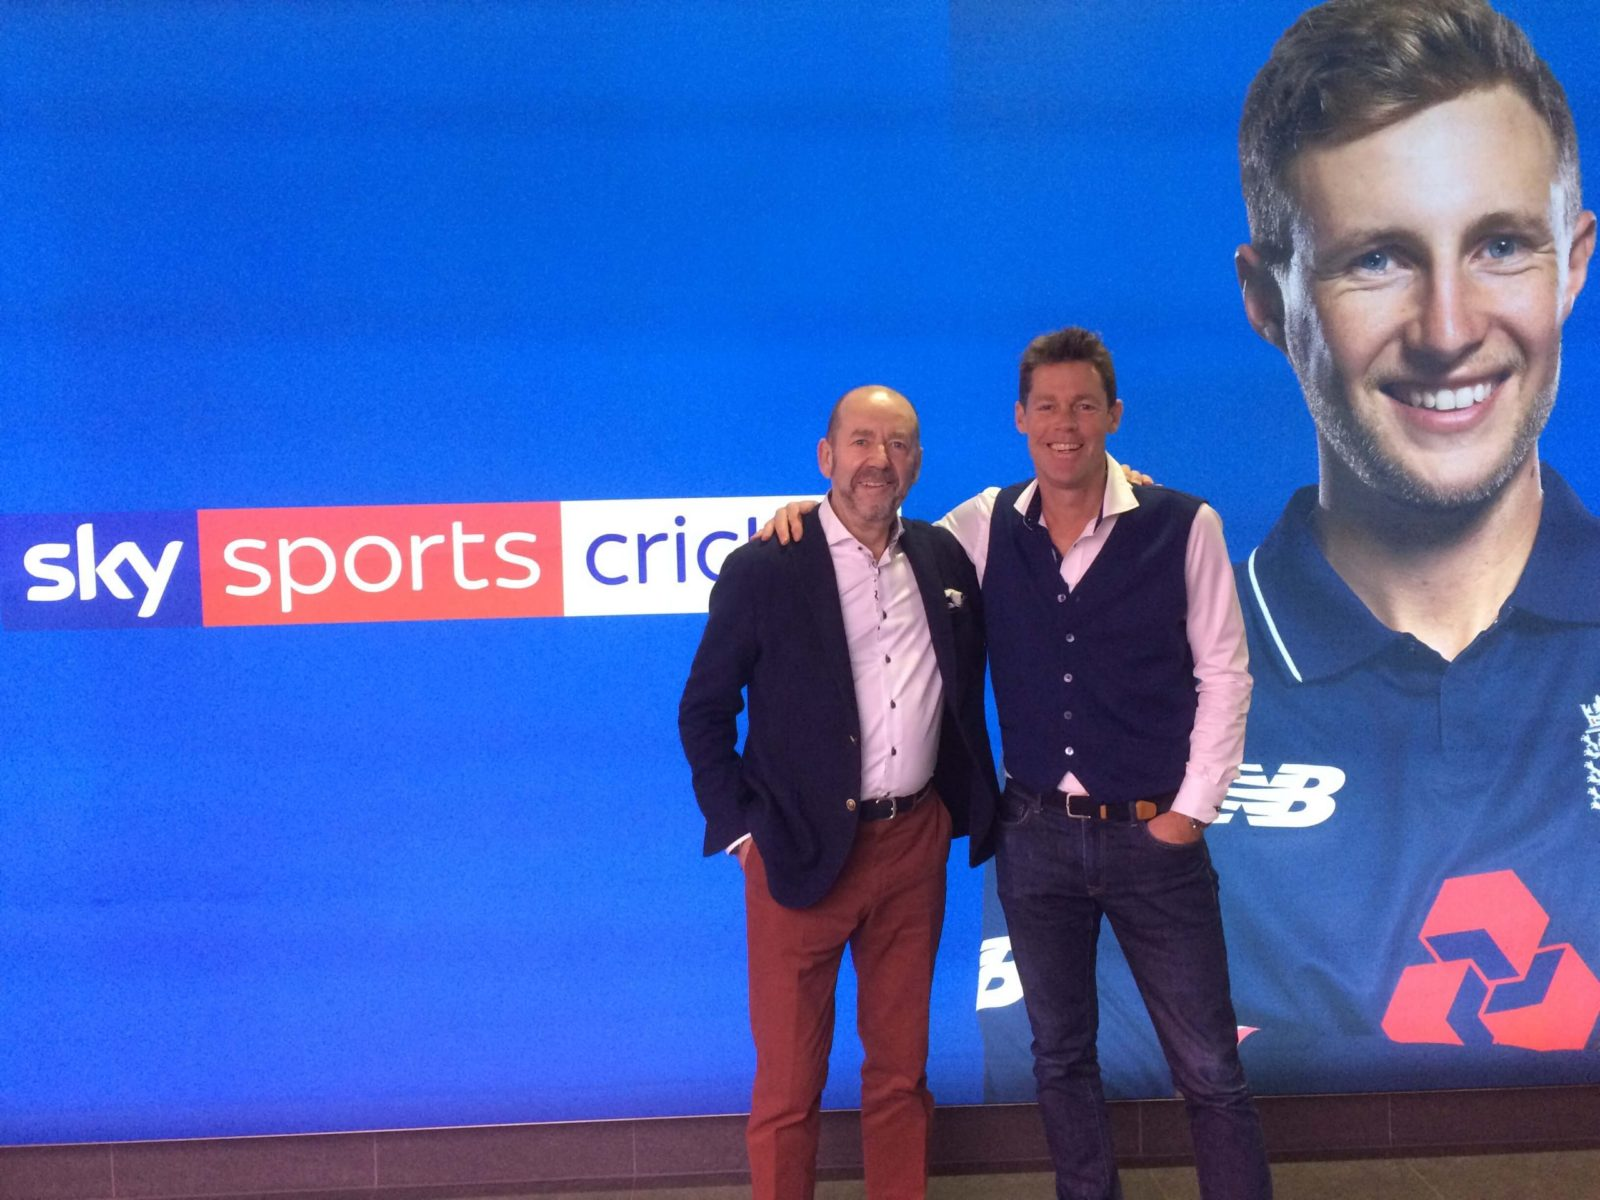 John Deane Bowers showing menswear at Sky Sports Cricket